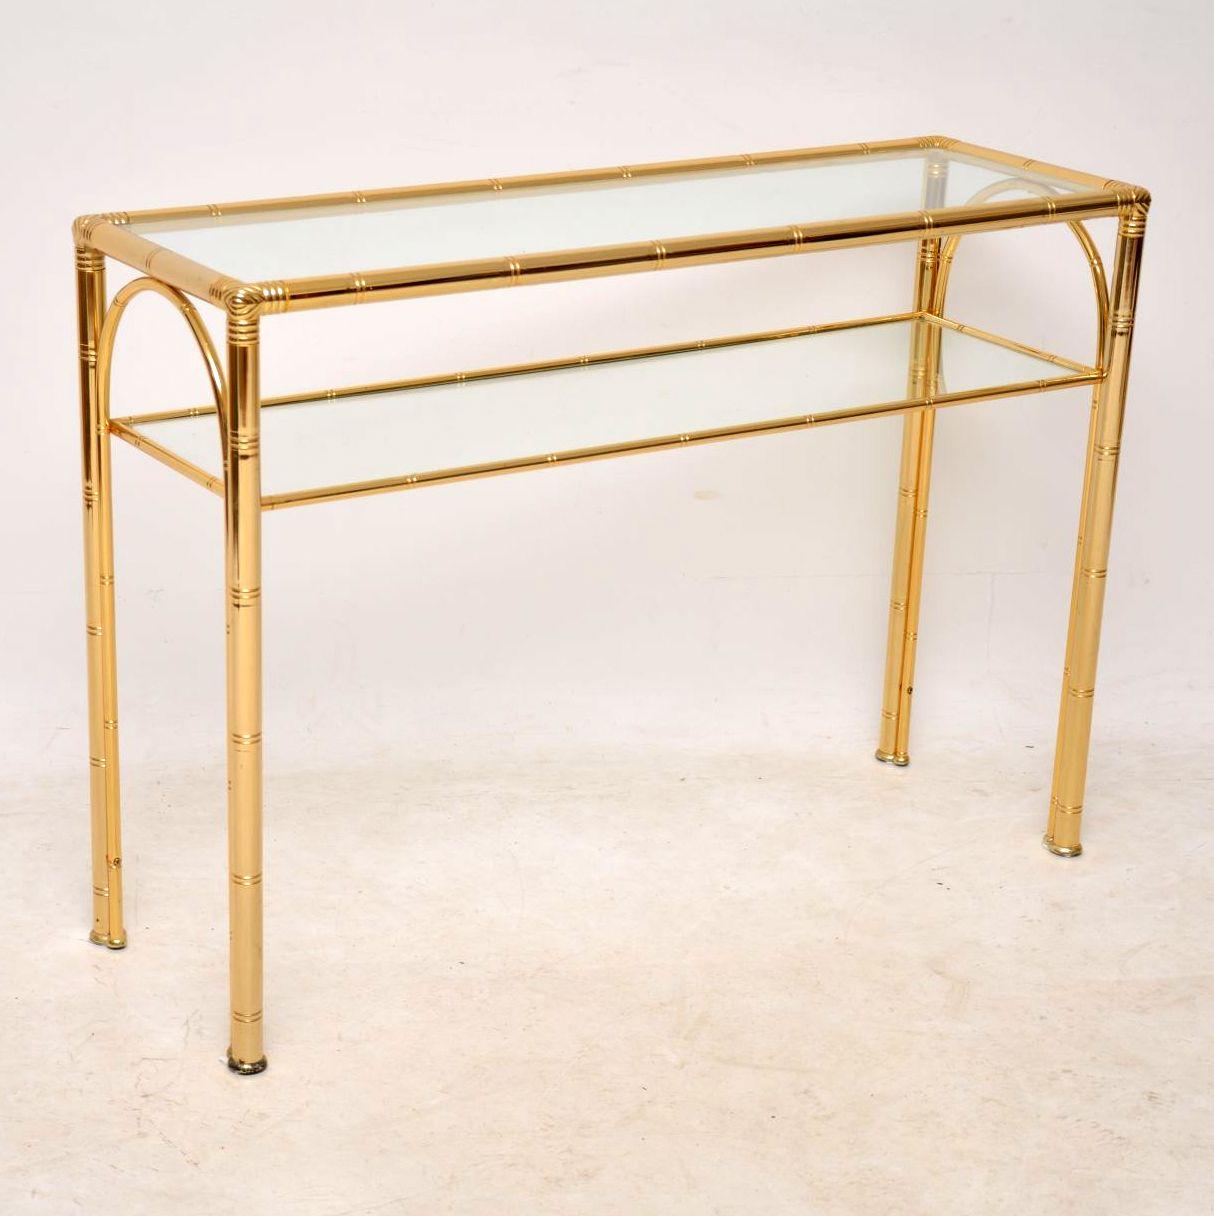 1970 S Vintage Brass Console Table Retrospective